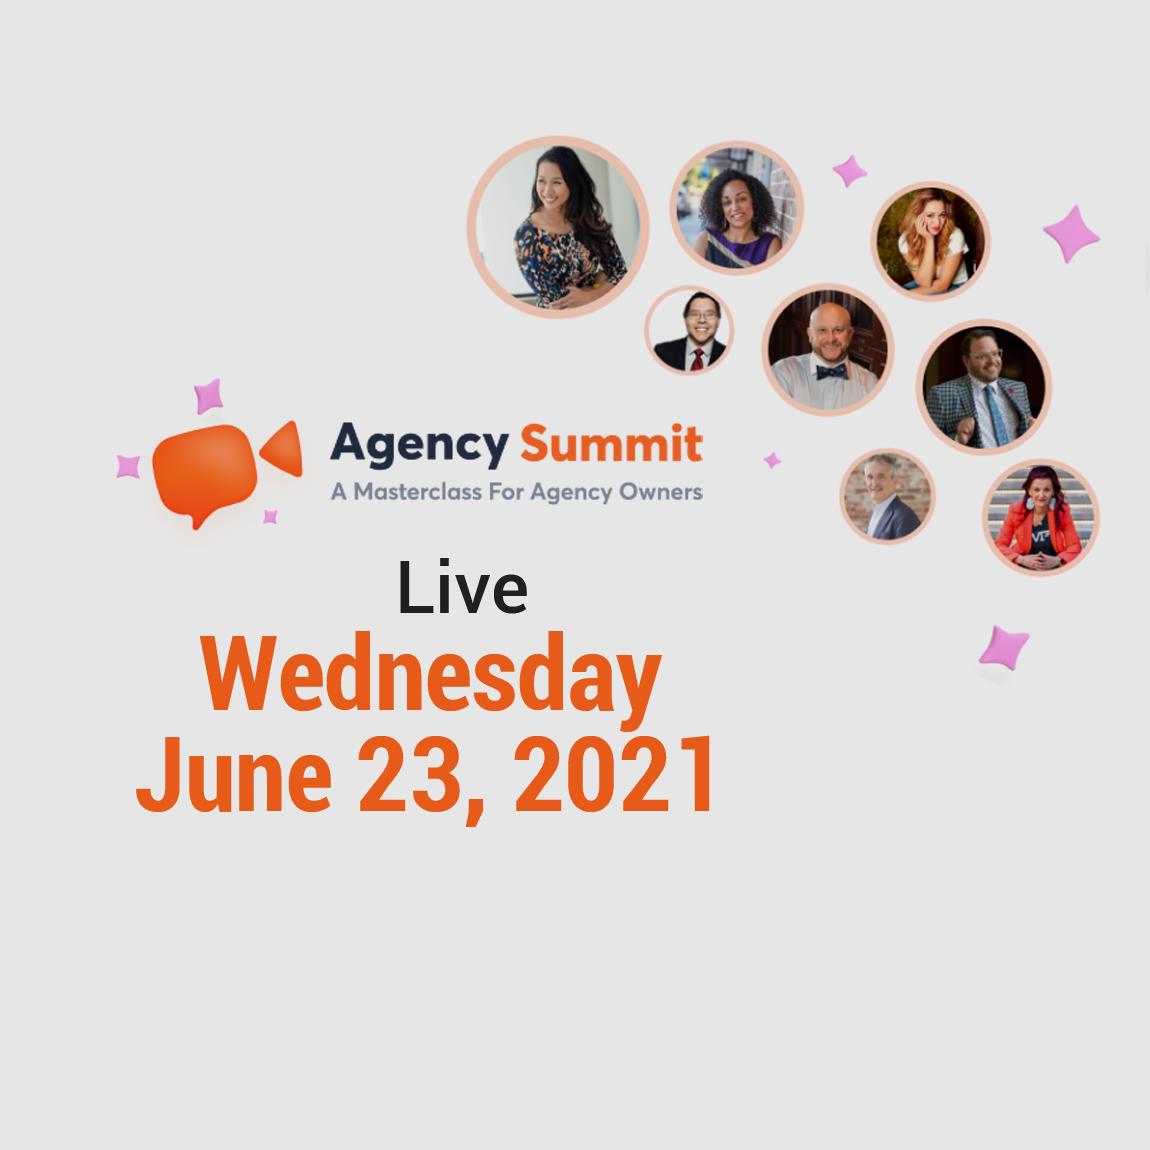 Agency Summit by Agorapulse